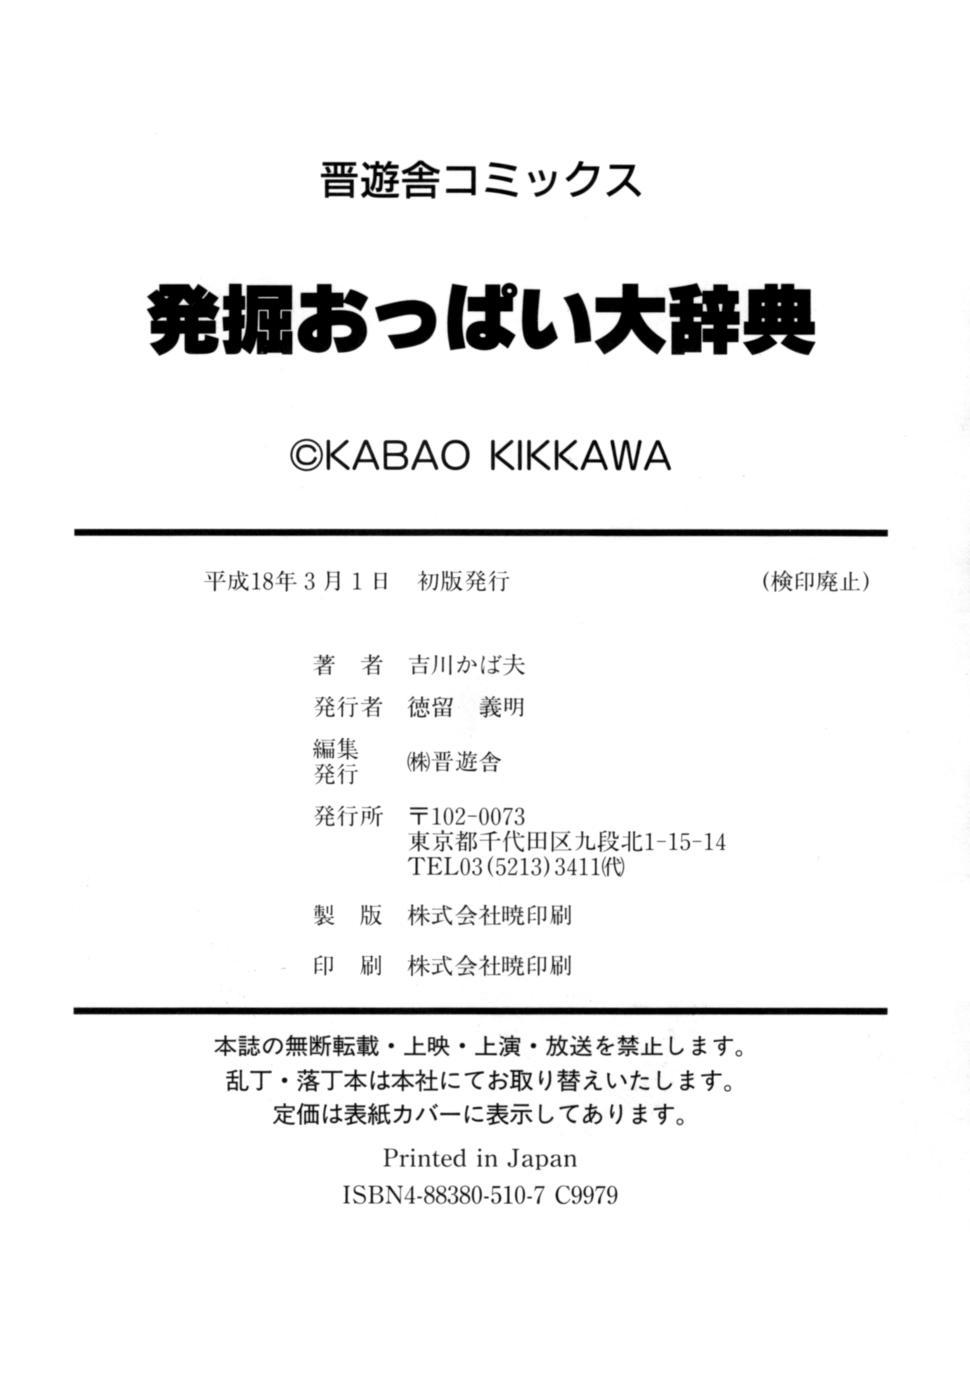 Hakkutsu Oppai Daijiten 196